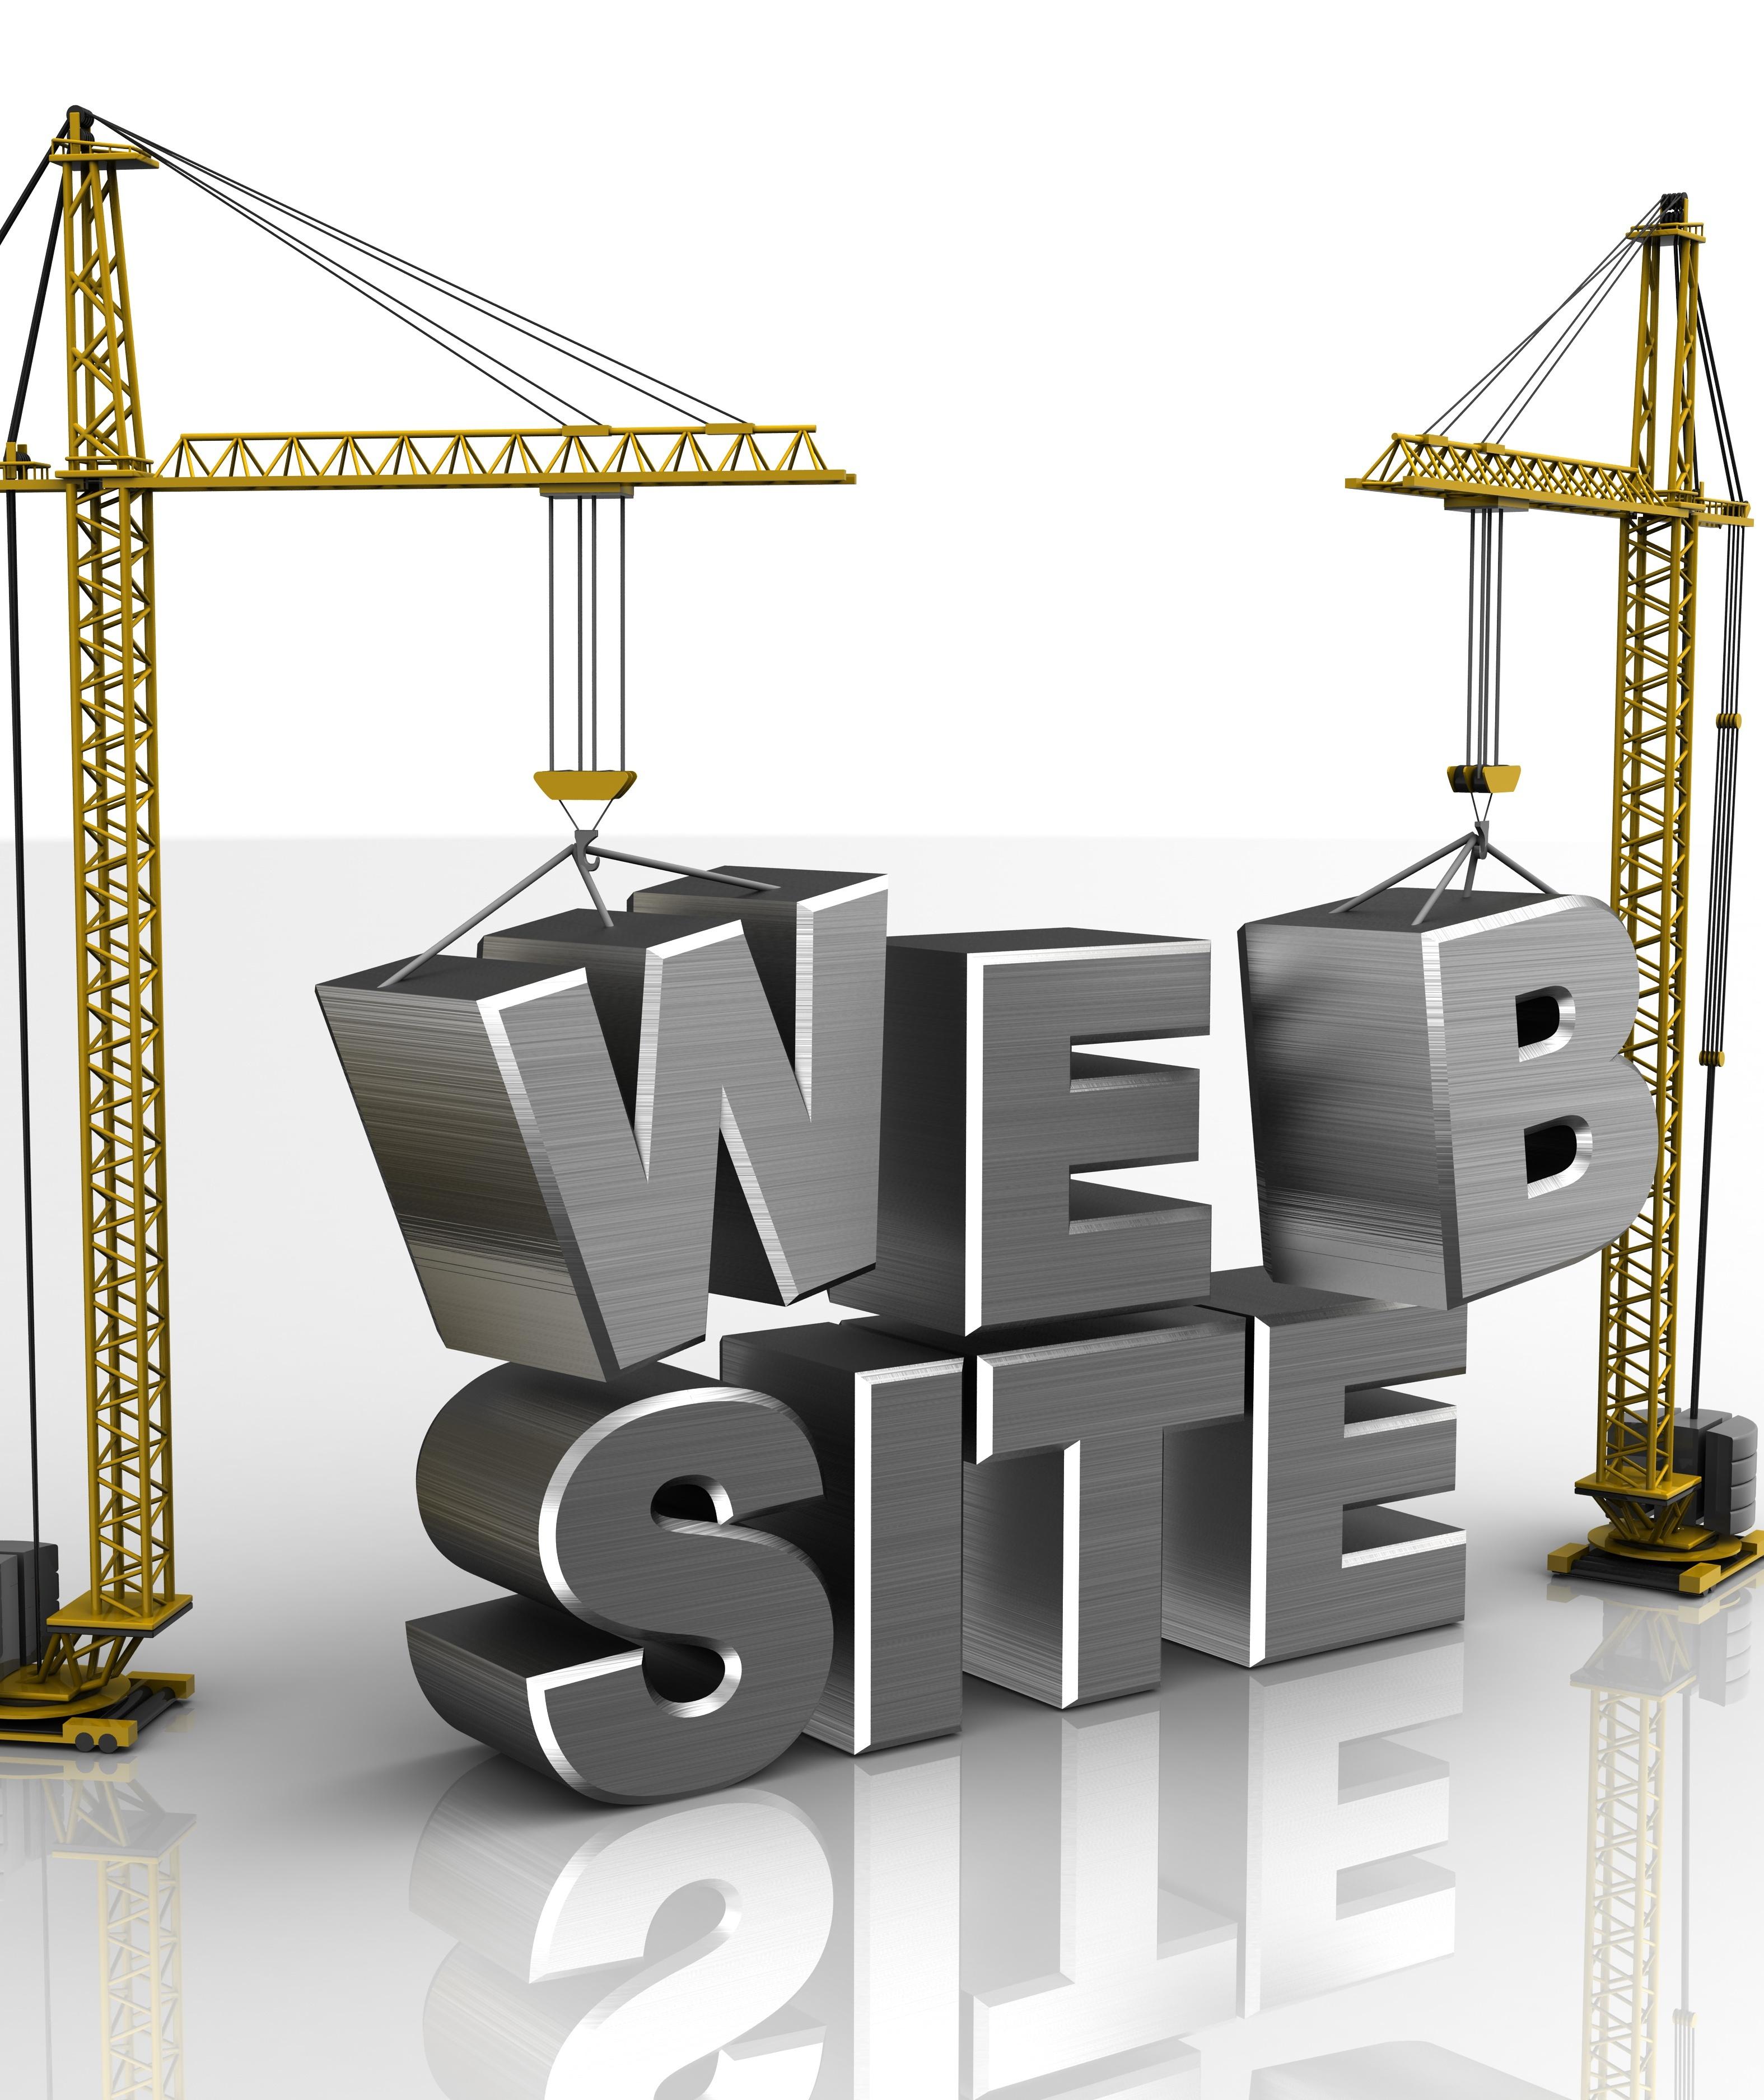 Building Websites Linen and Uniform Companies